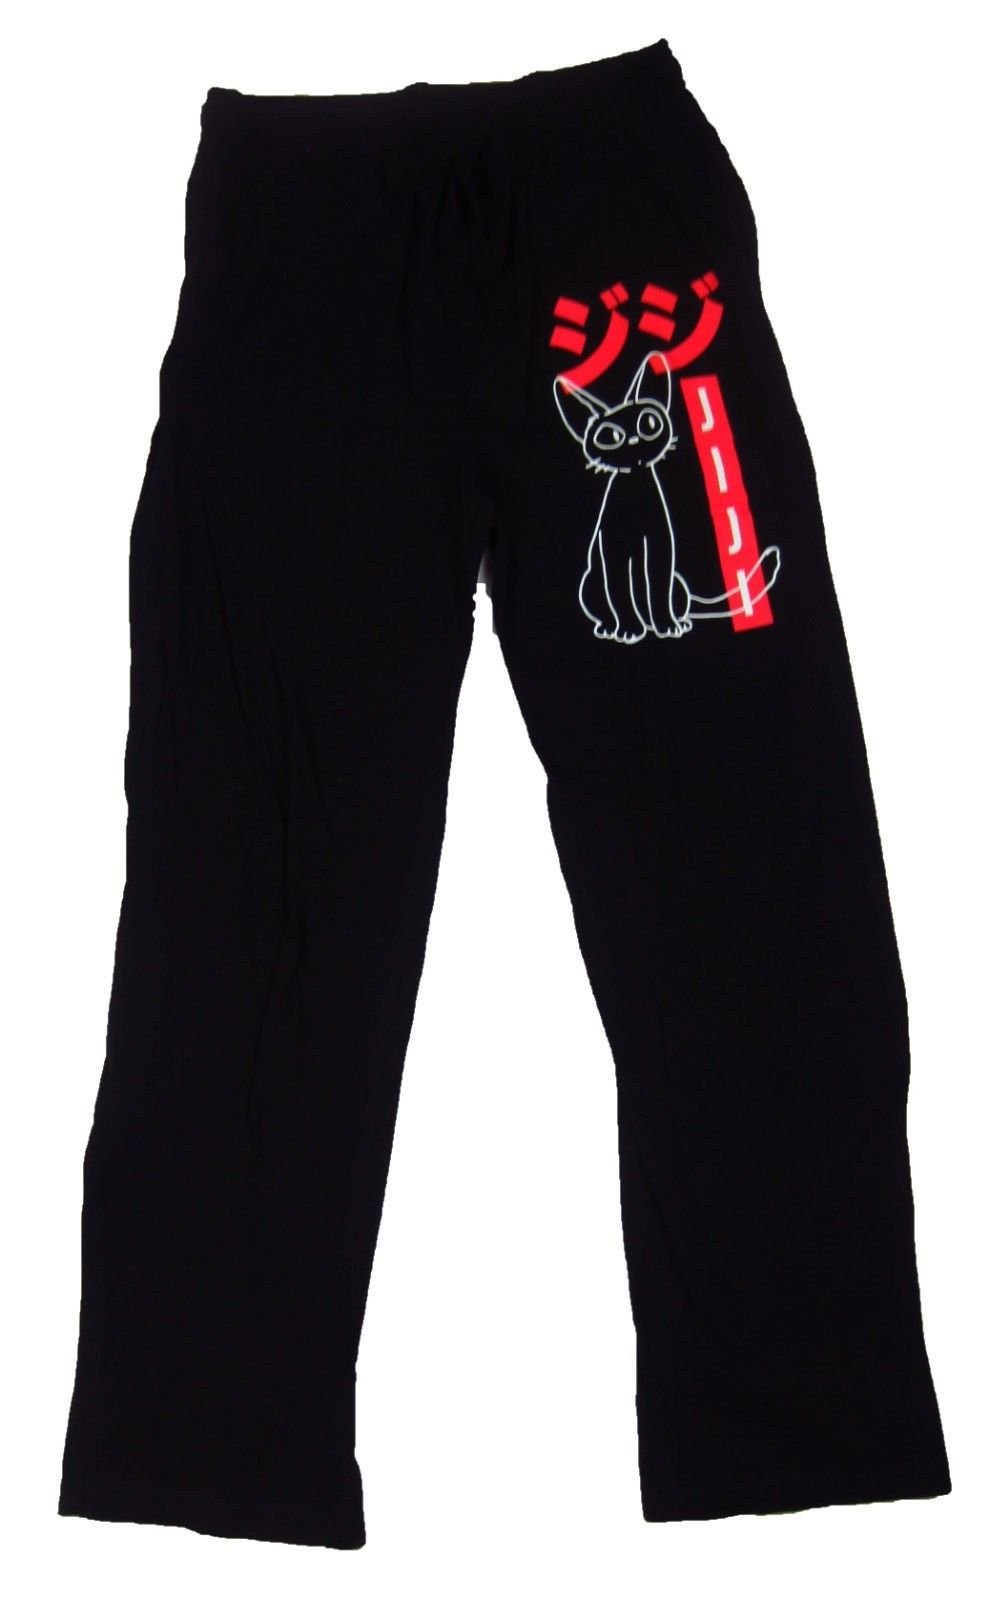 9a162e9e622 Mens Womens NEW Kiki s Delivery Service Cat Jiji Pajama Lounge Pants Size  XS-2XL